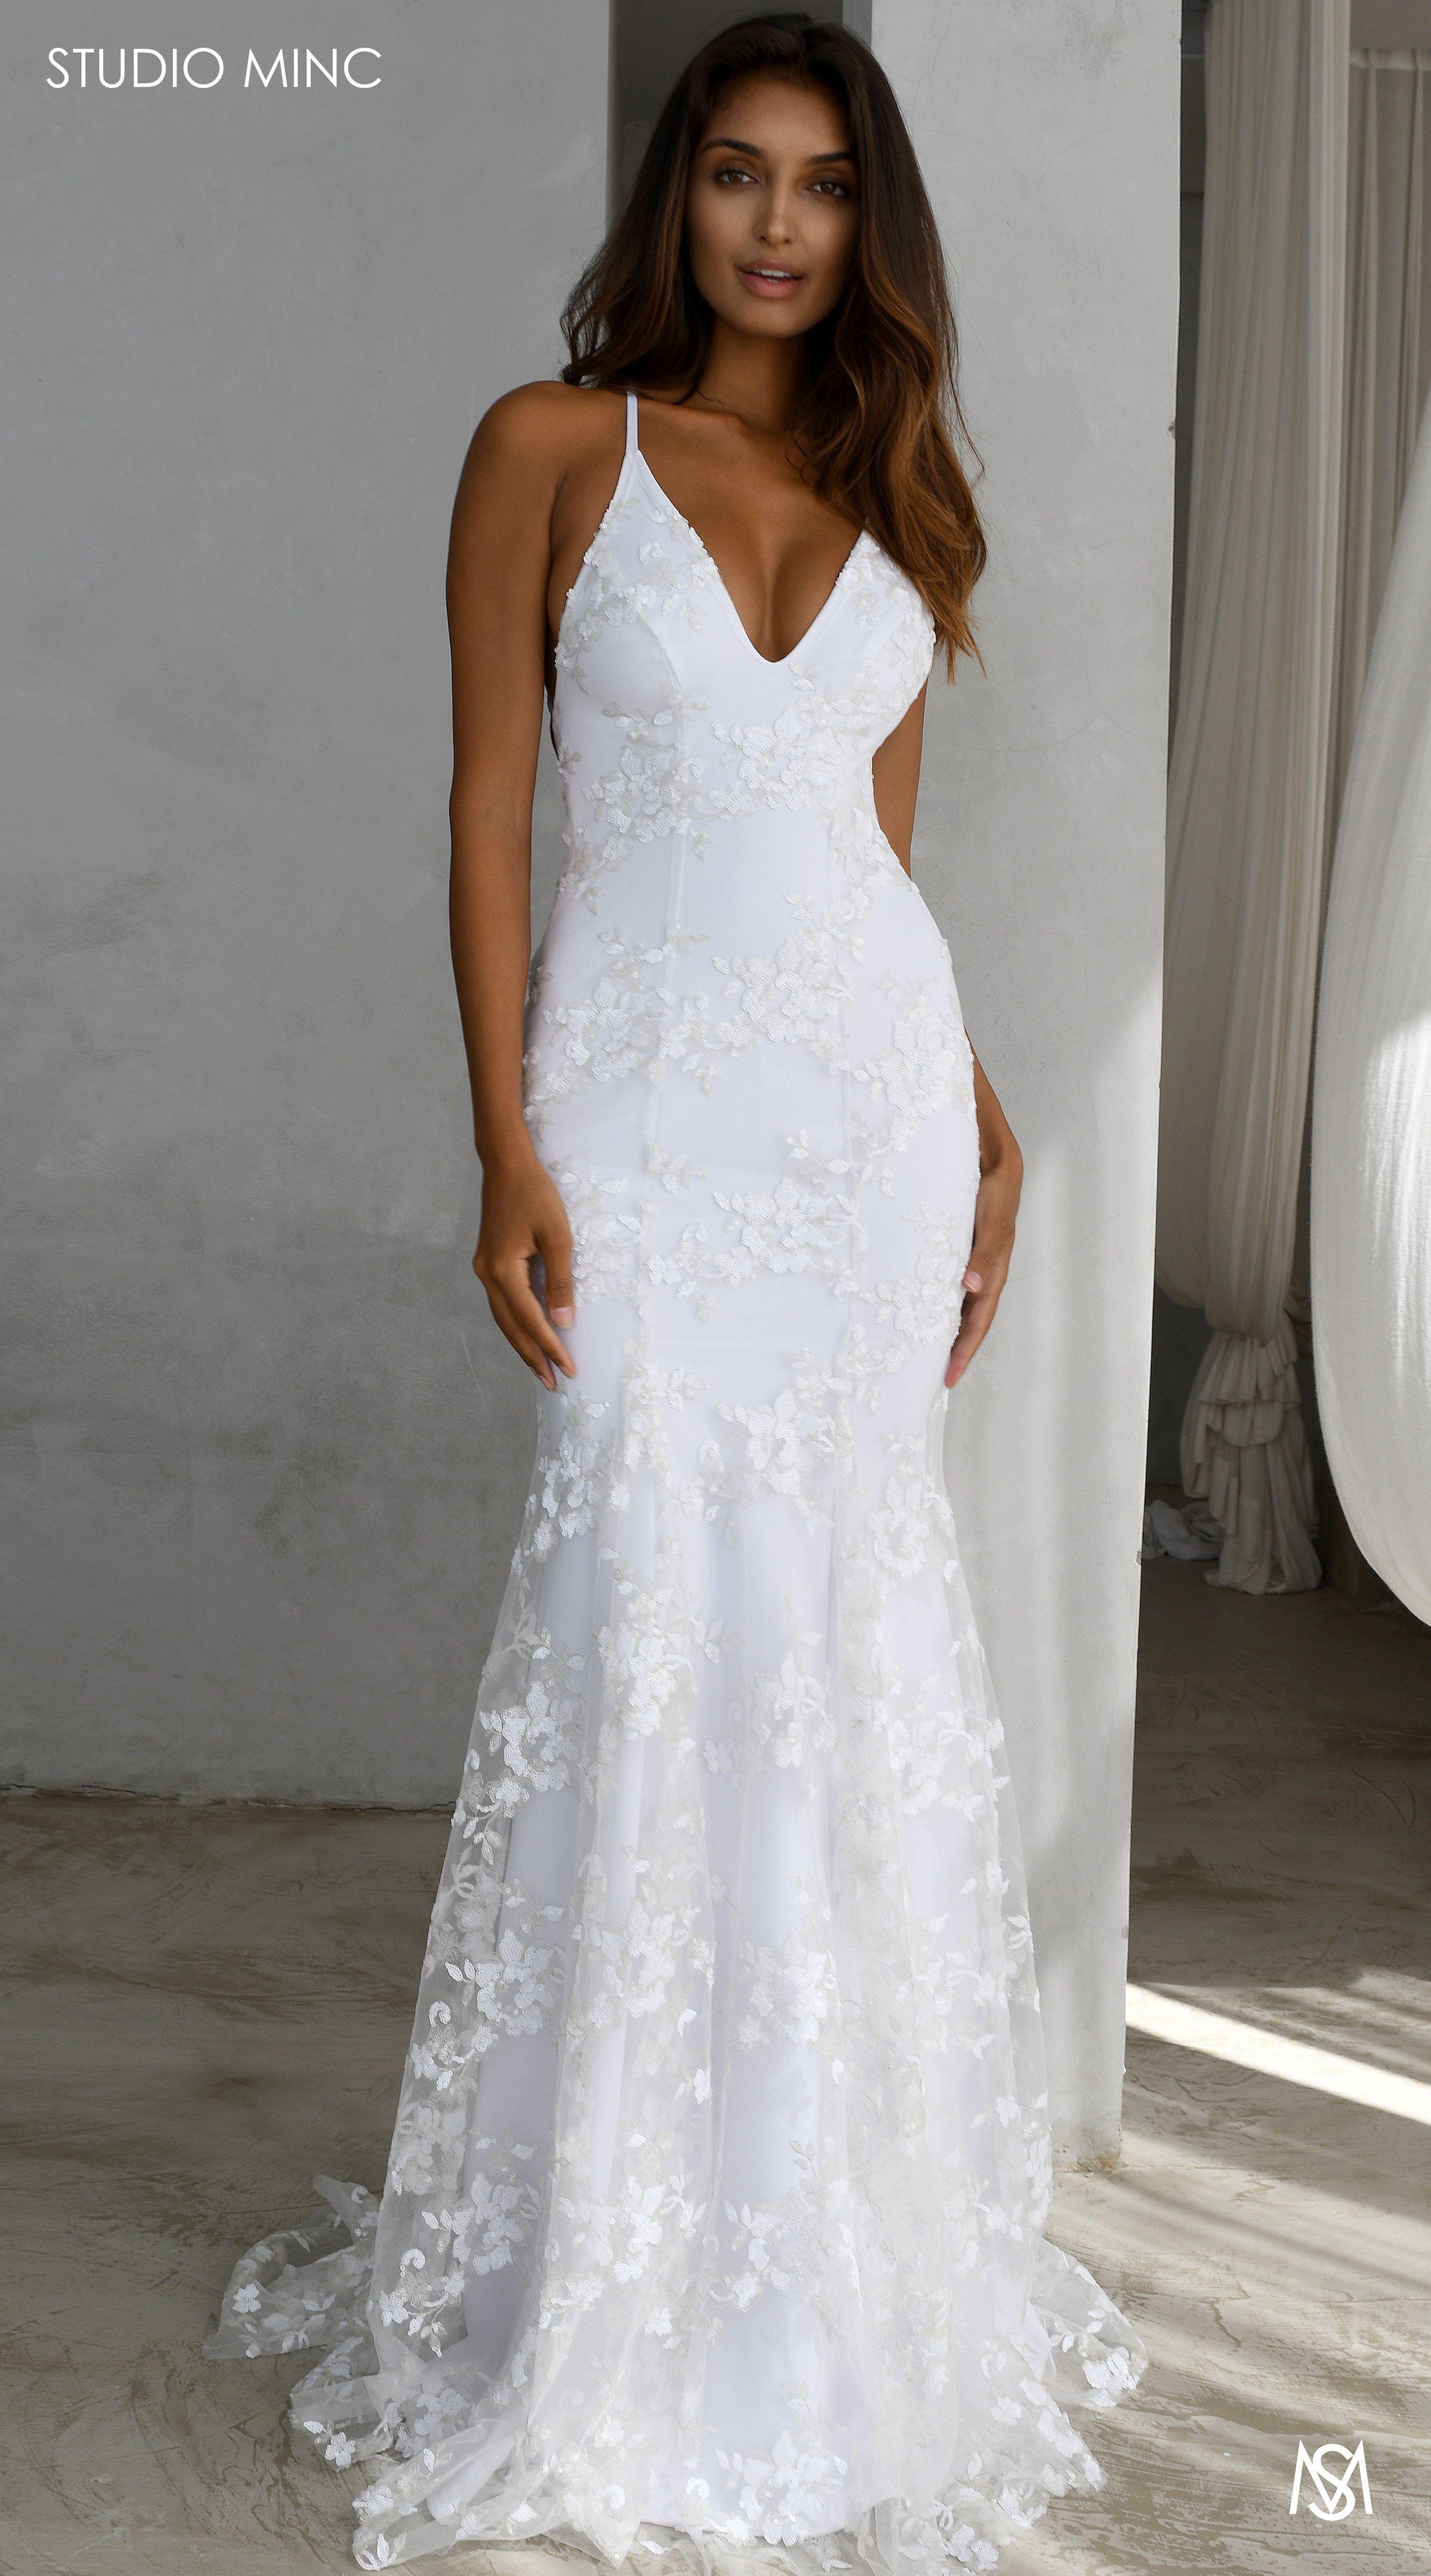 42++ Wedding dress patterns australia information